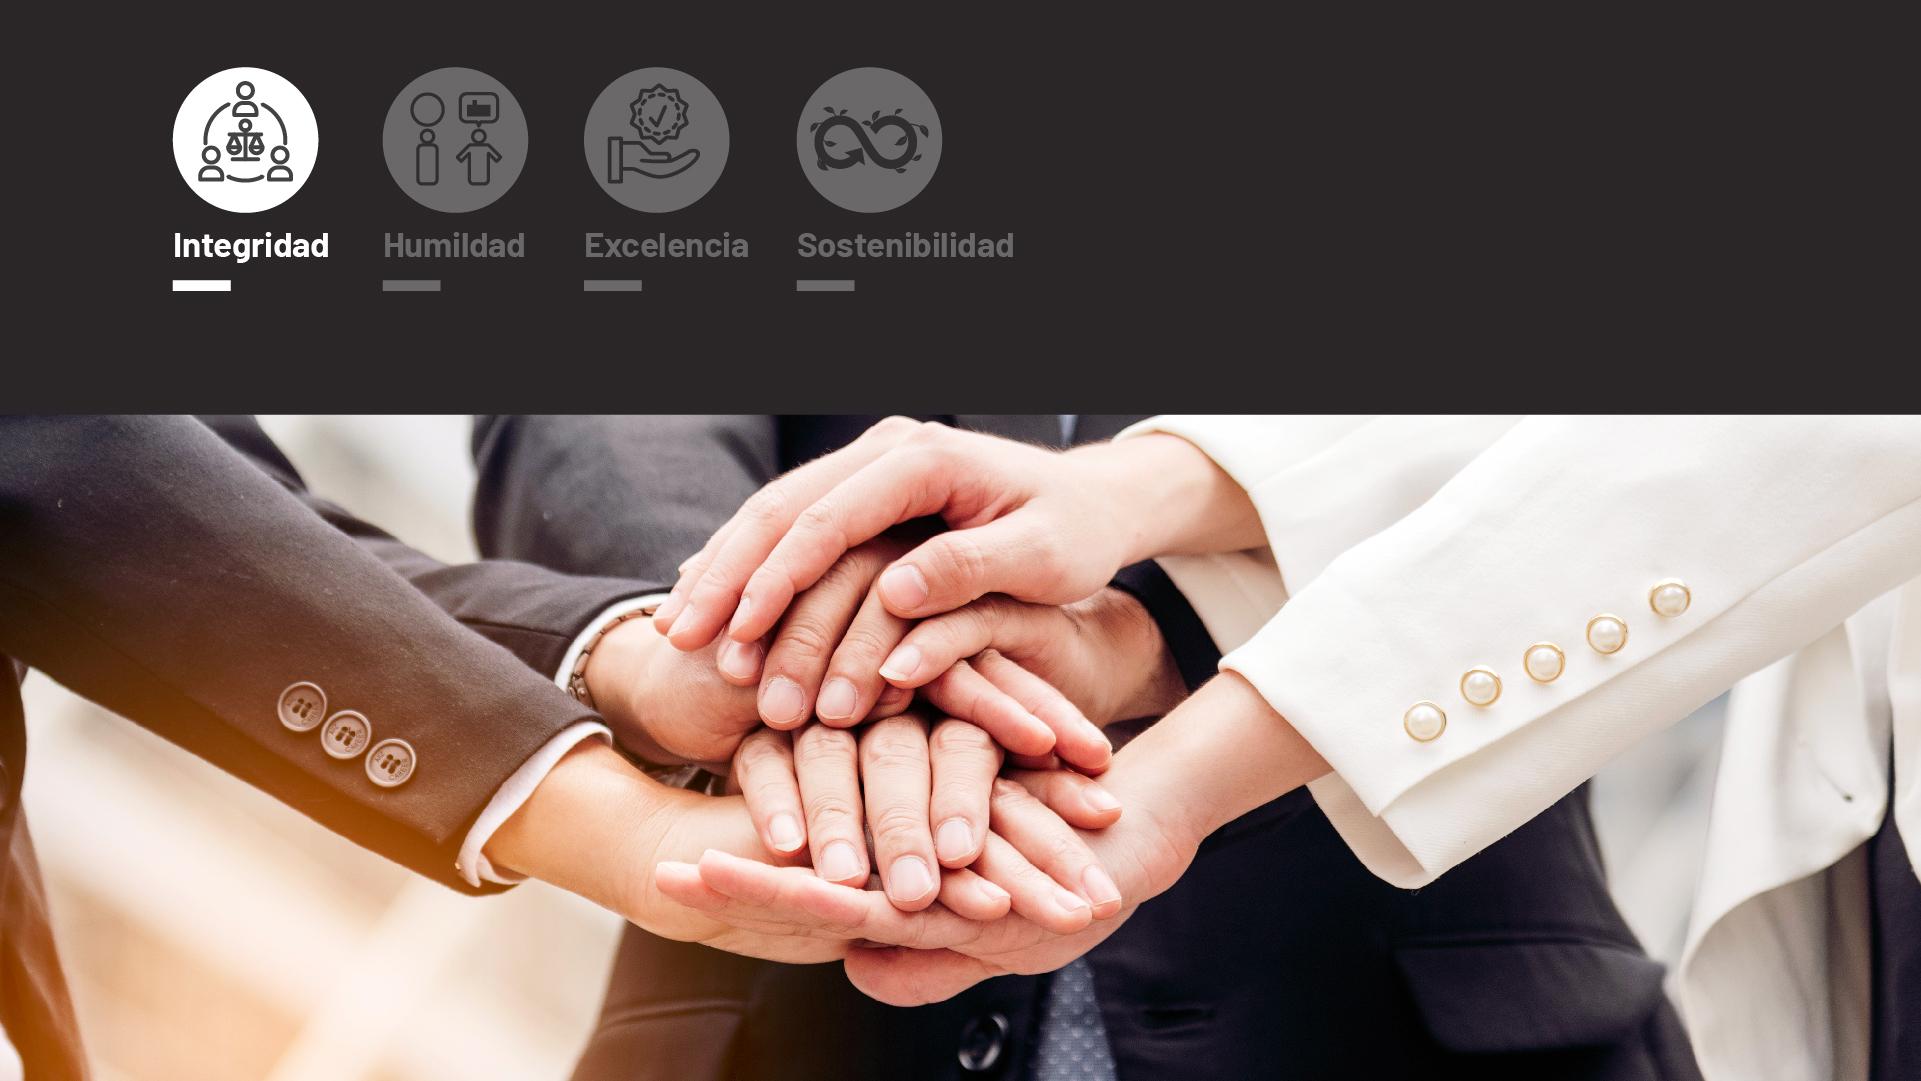 Valores de Friselva, empresa cárnica: Nuestra Integridad